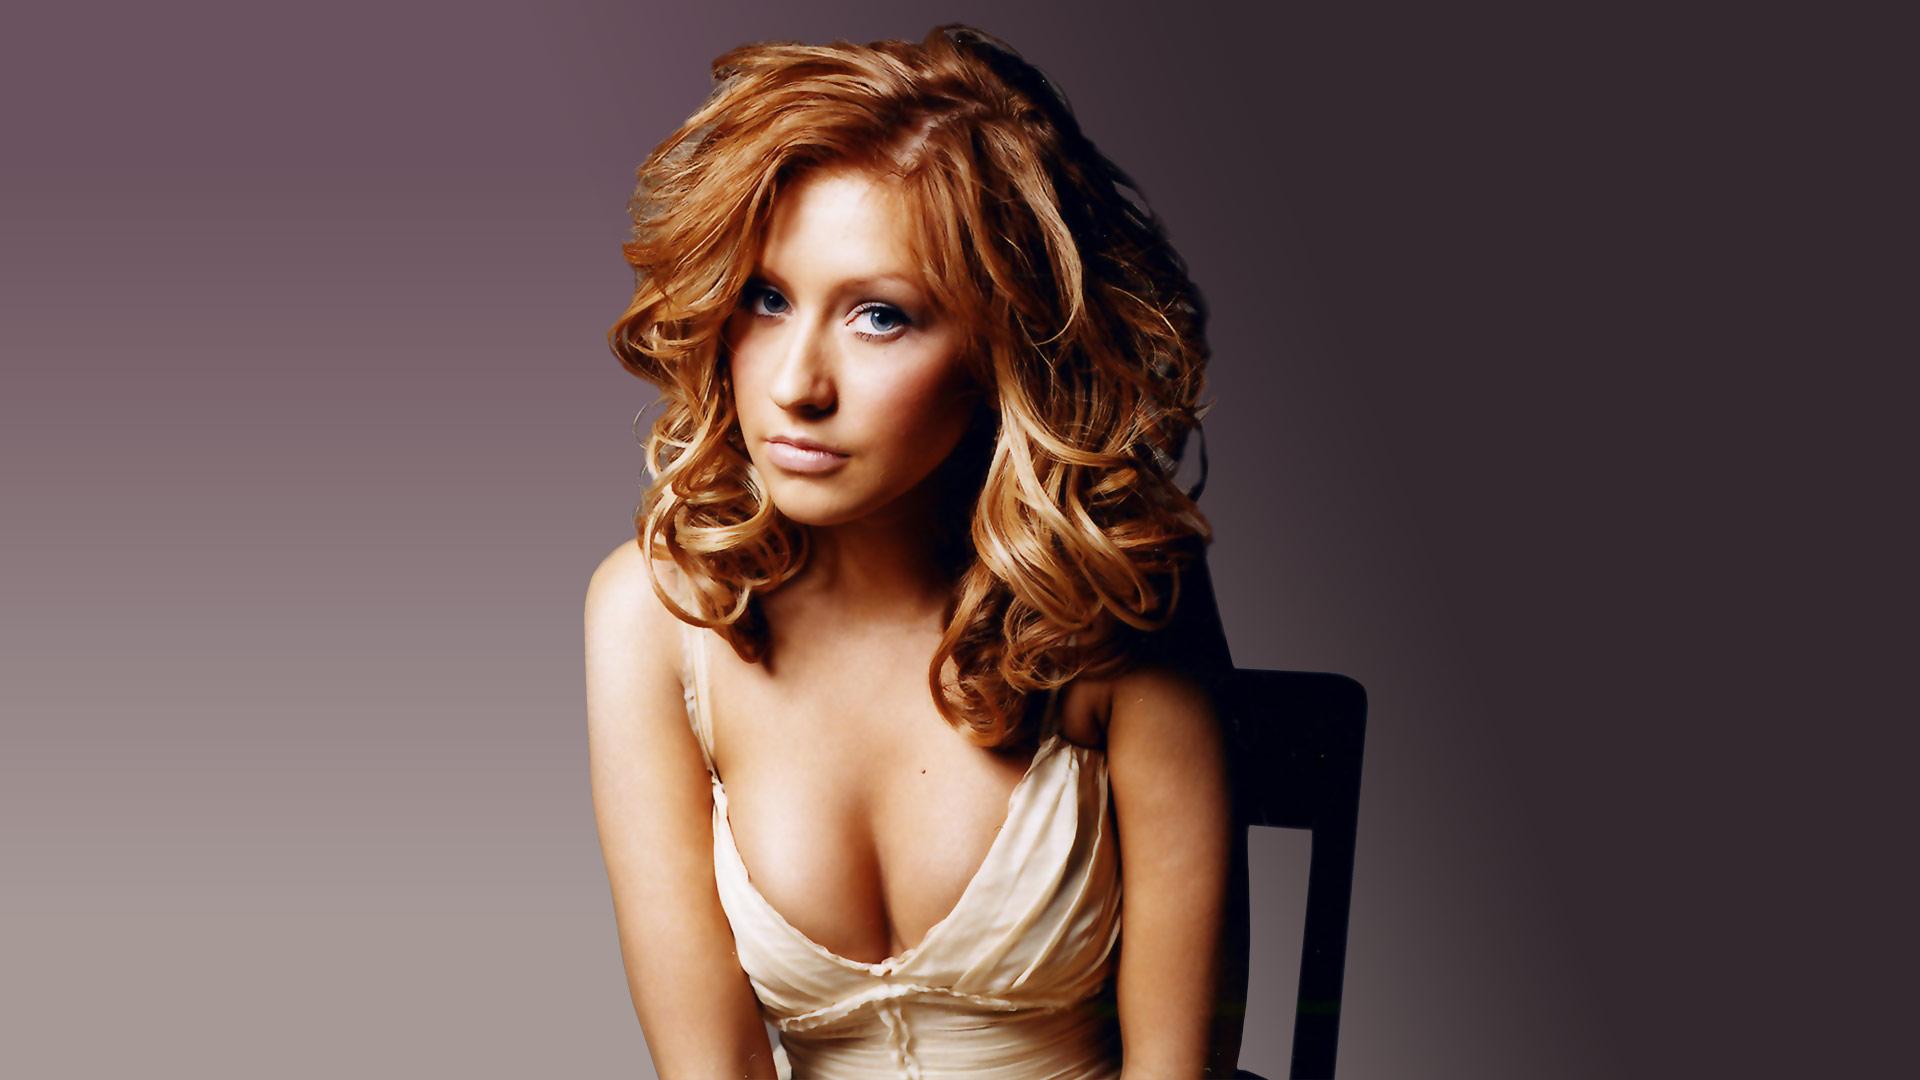 Christina Aguilera backdrop wallpaper